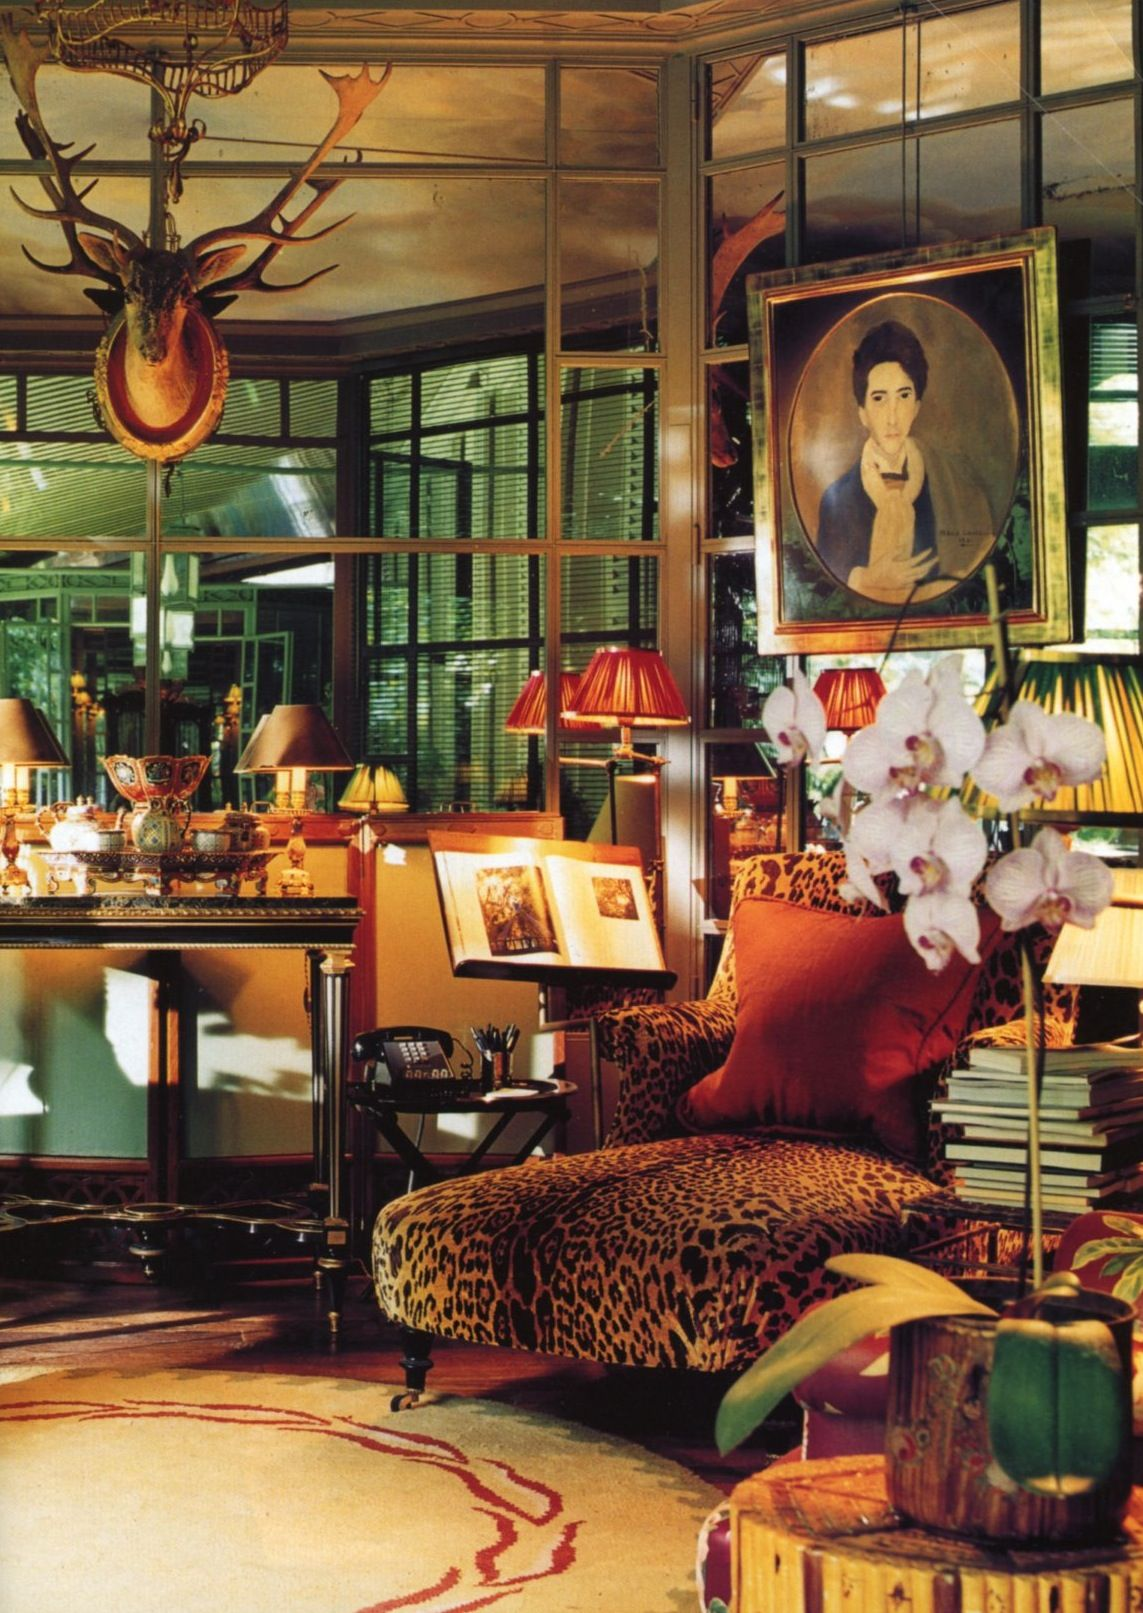 Leopard decoraci n africana pinterest interiores - Decoracion africana ...